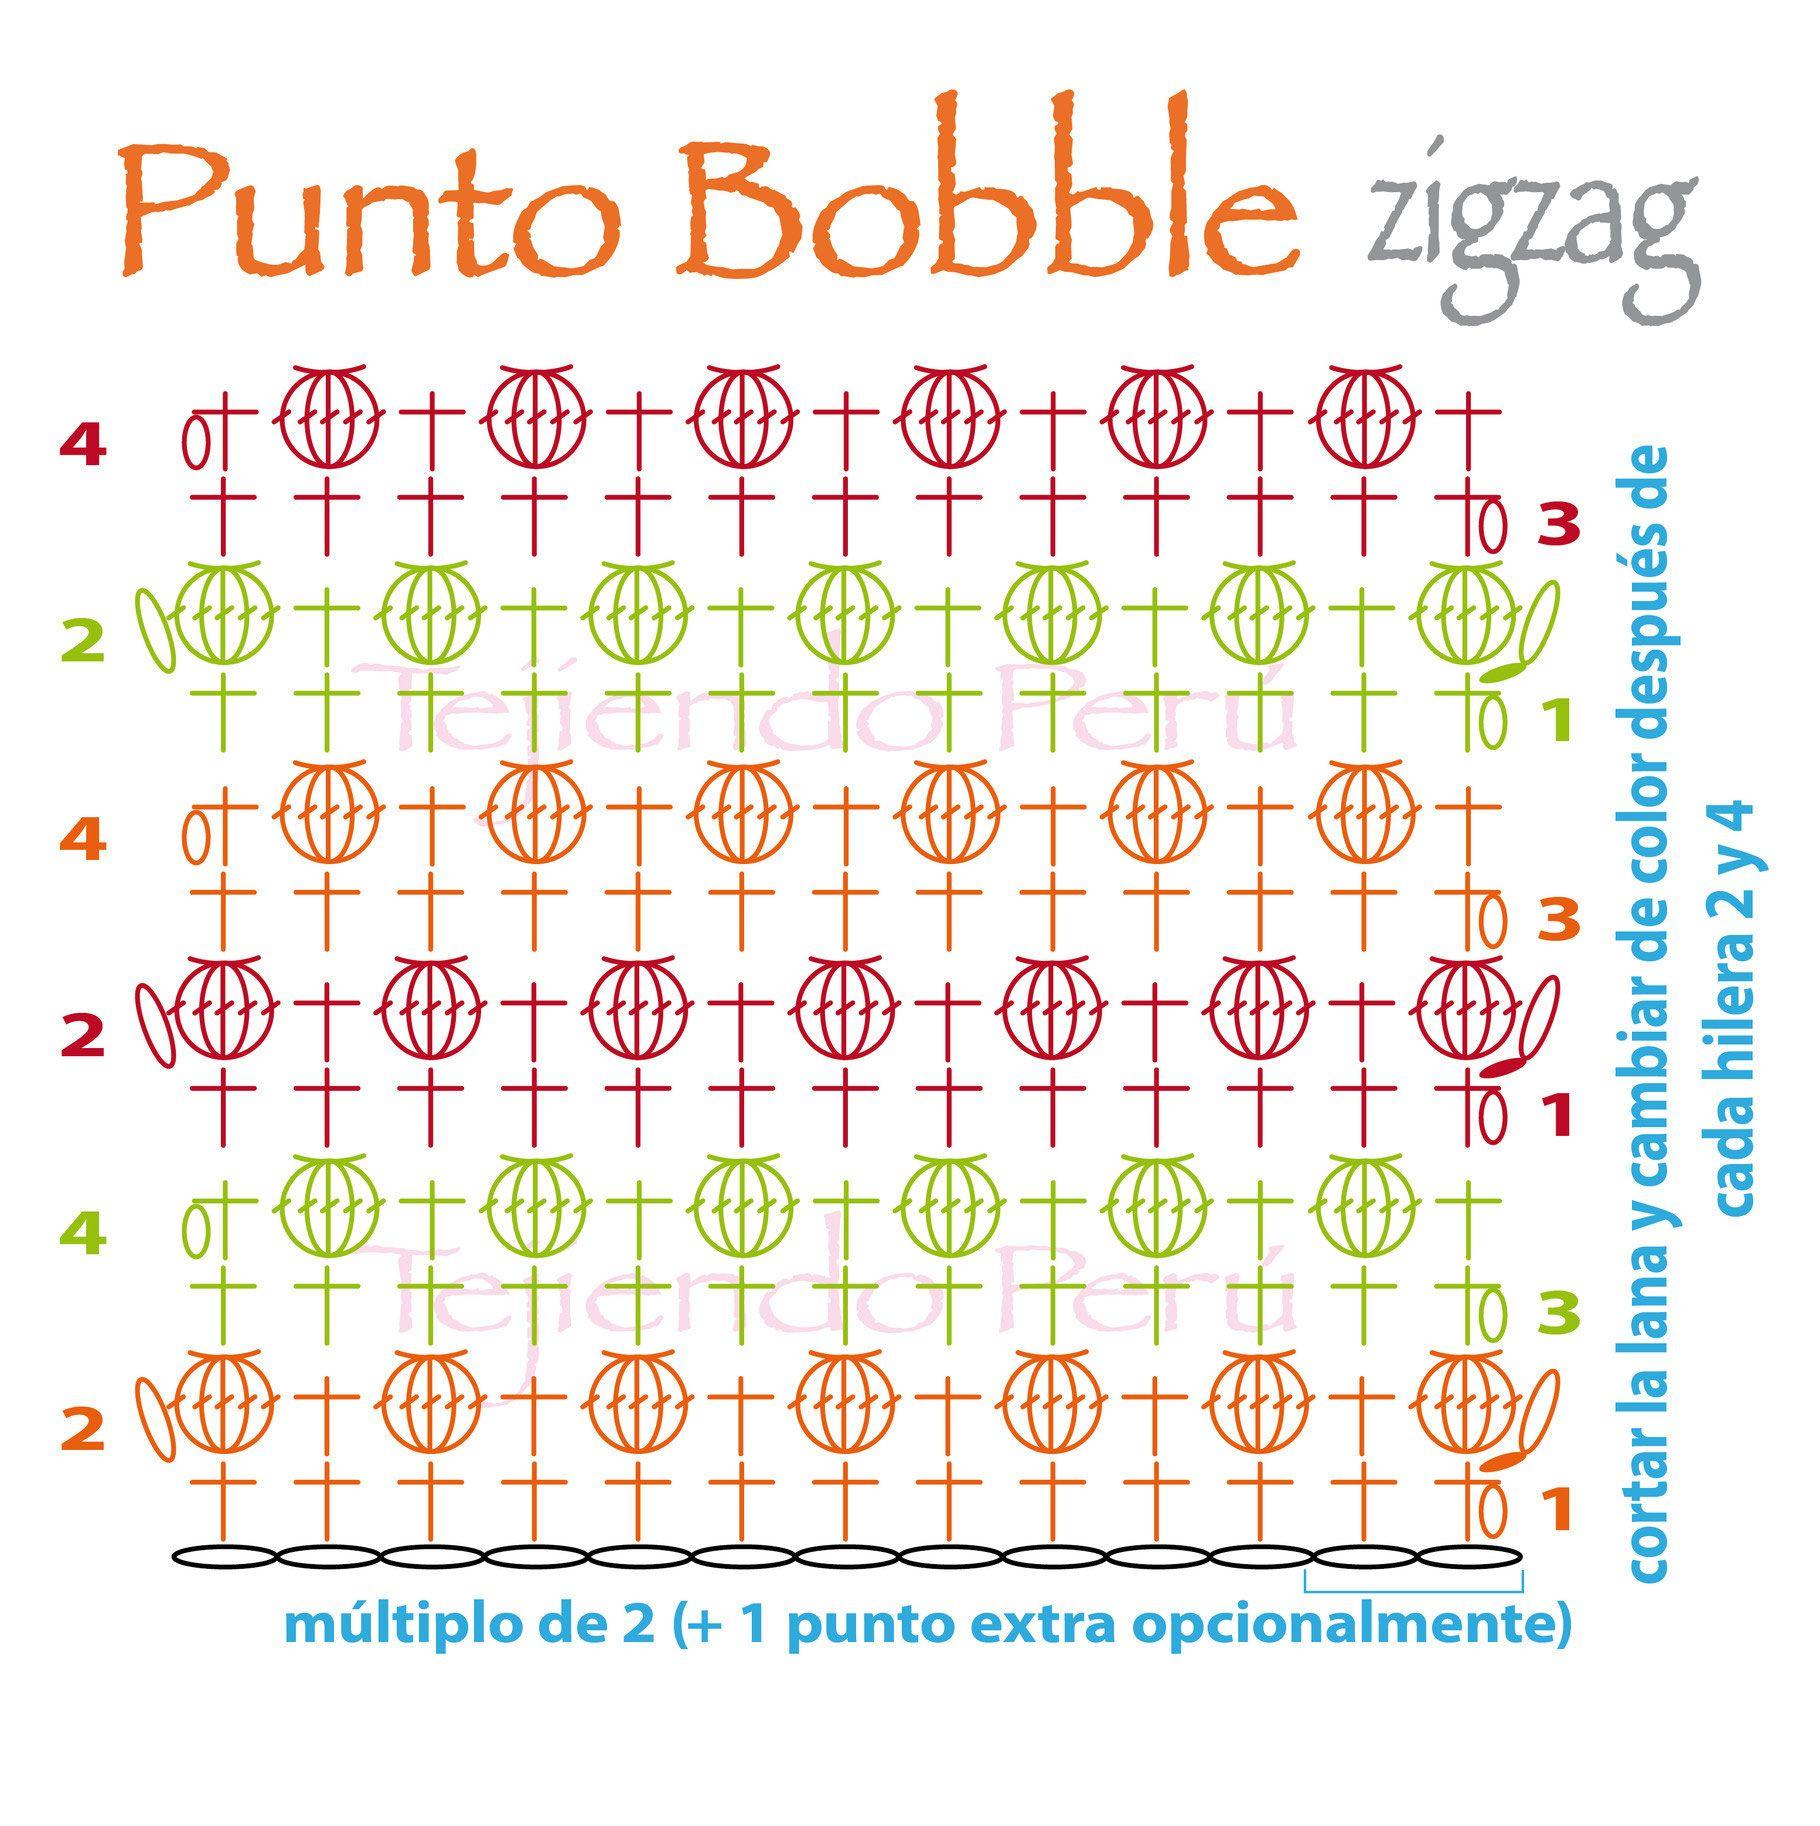 Punto bobble en zigzag tejido a crochet (crochet bobble stitch ...